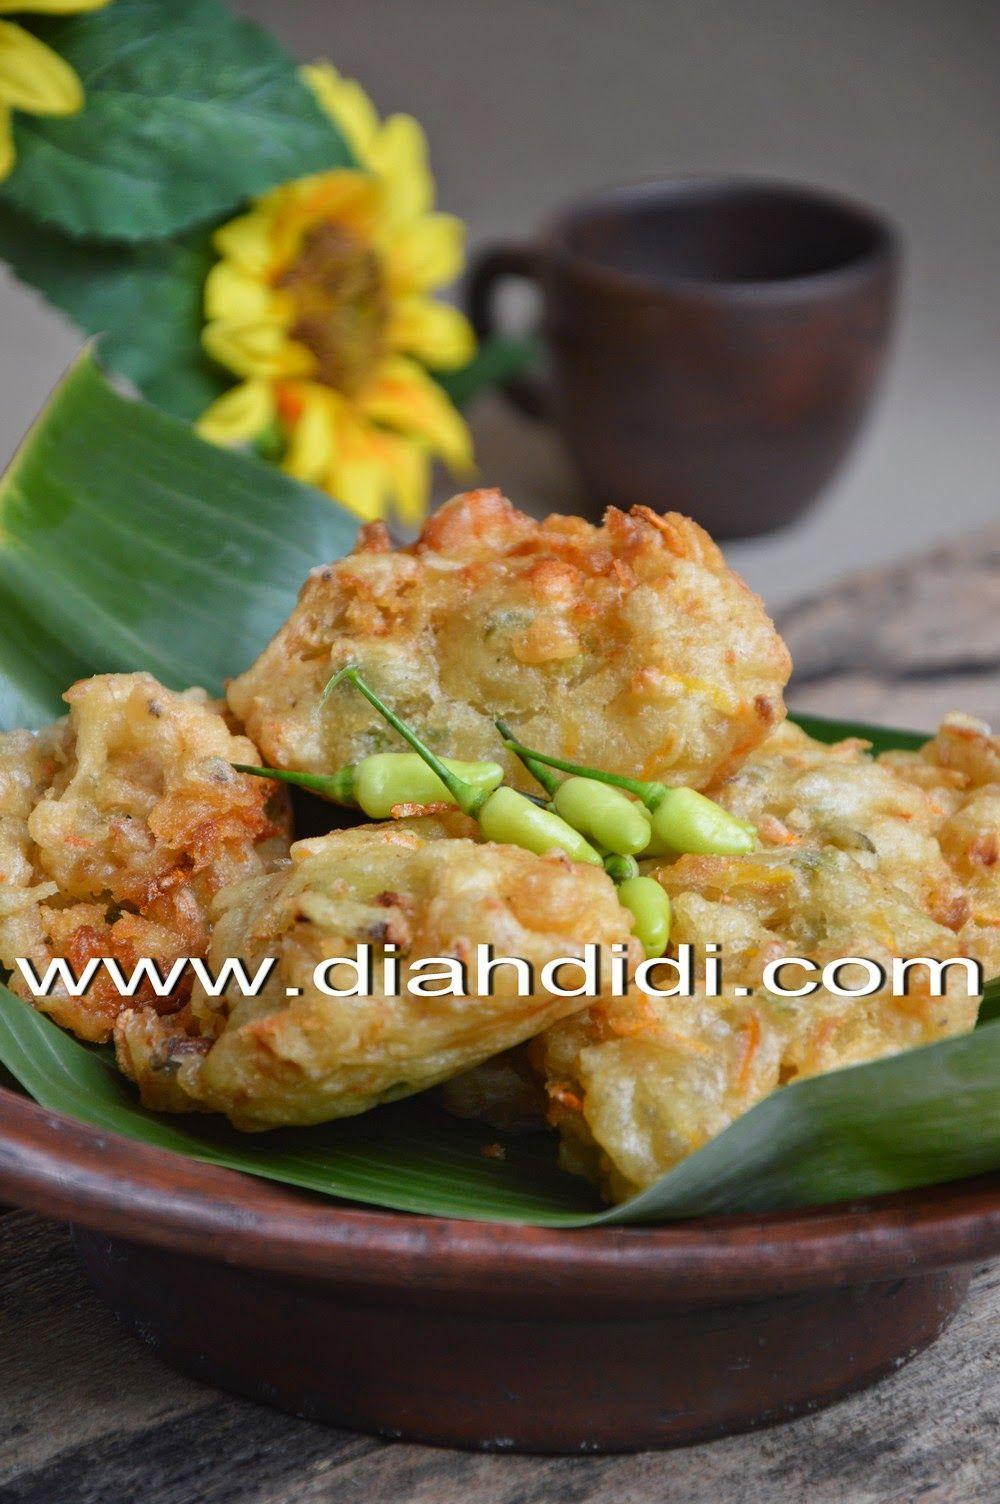 Bakwan Jamur Tiram Udang Makan Malam Makanan Dan Minuman Resep Masakan